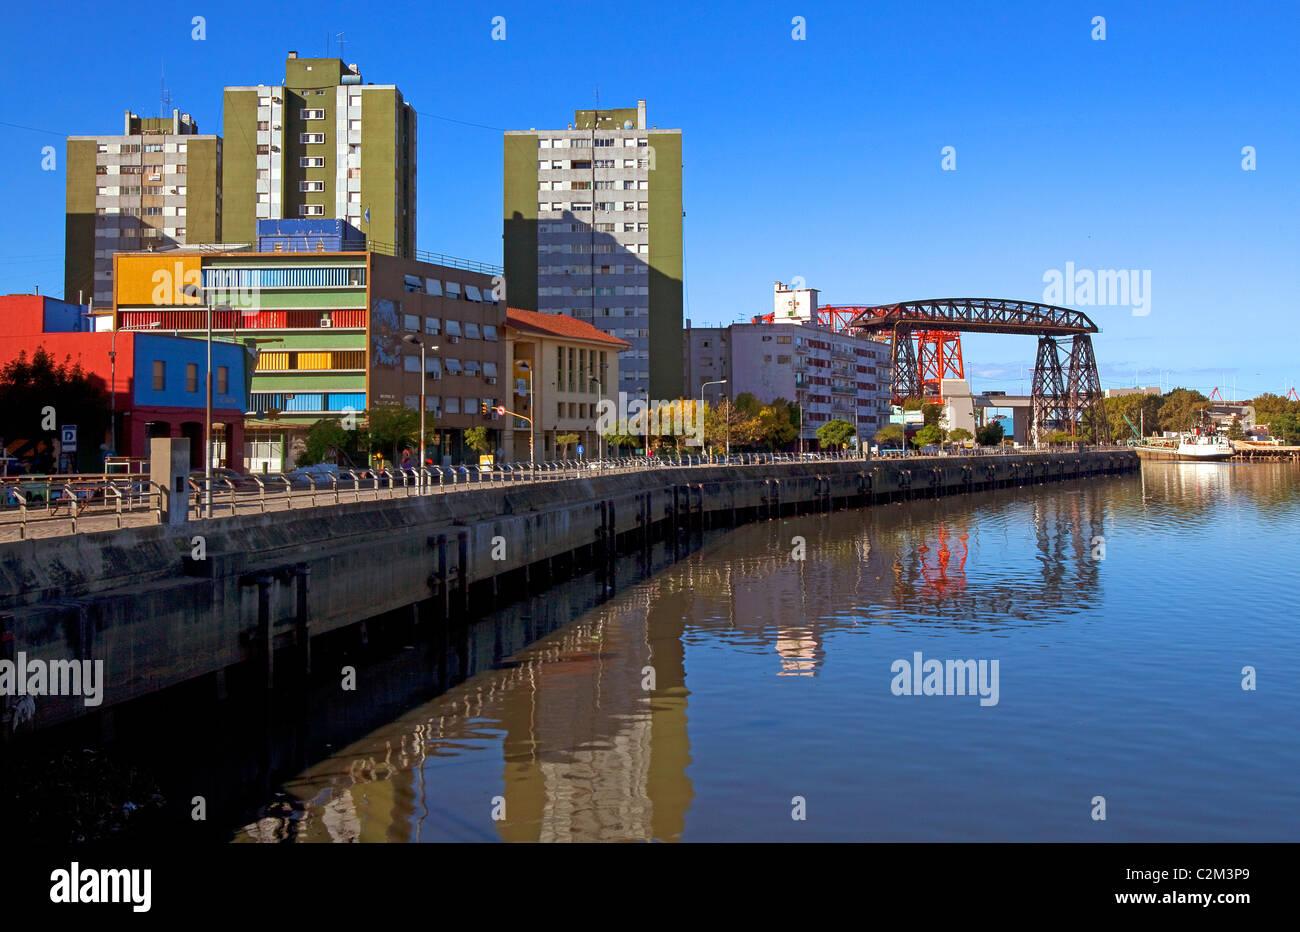 La Boca Port, Buenos Aires, Argentina. Stock Photo